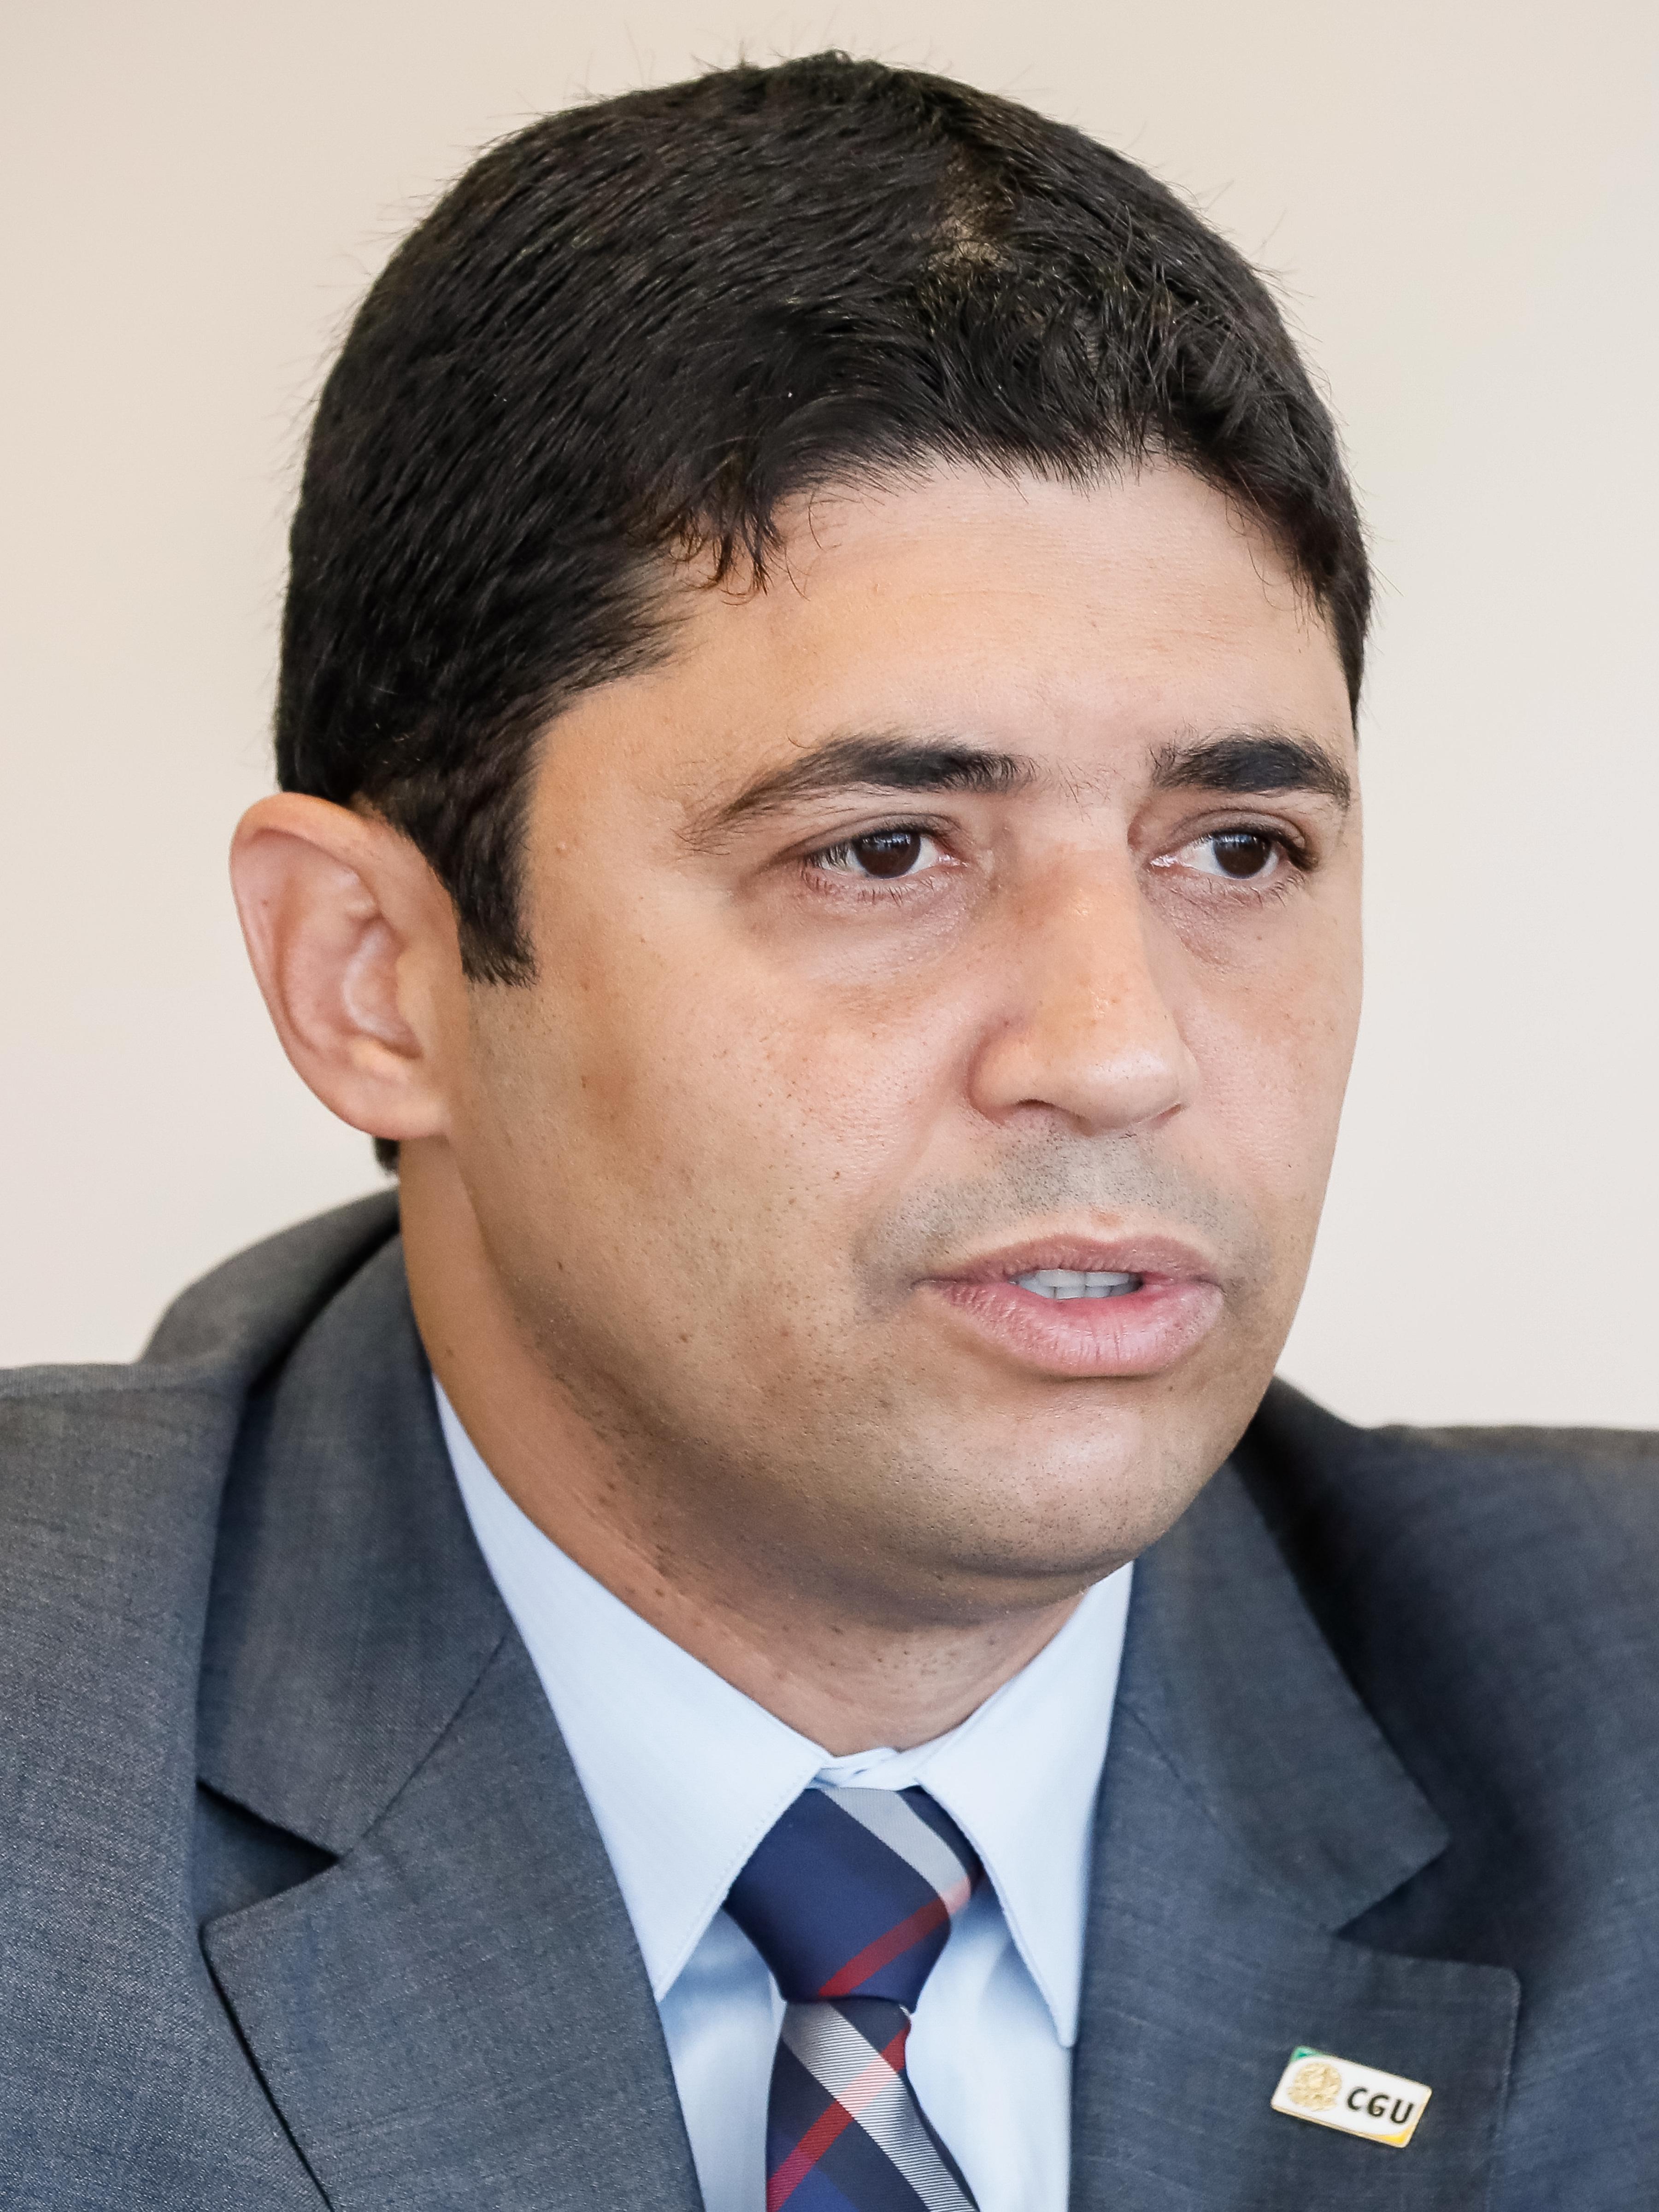 Rosário in July 2019